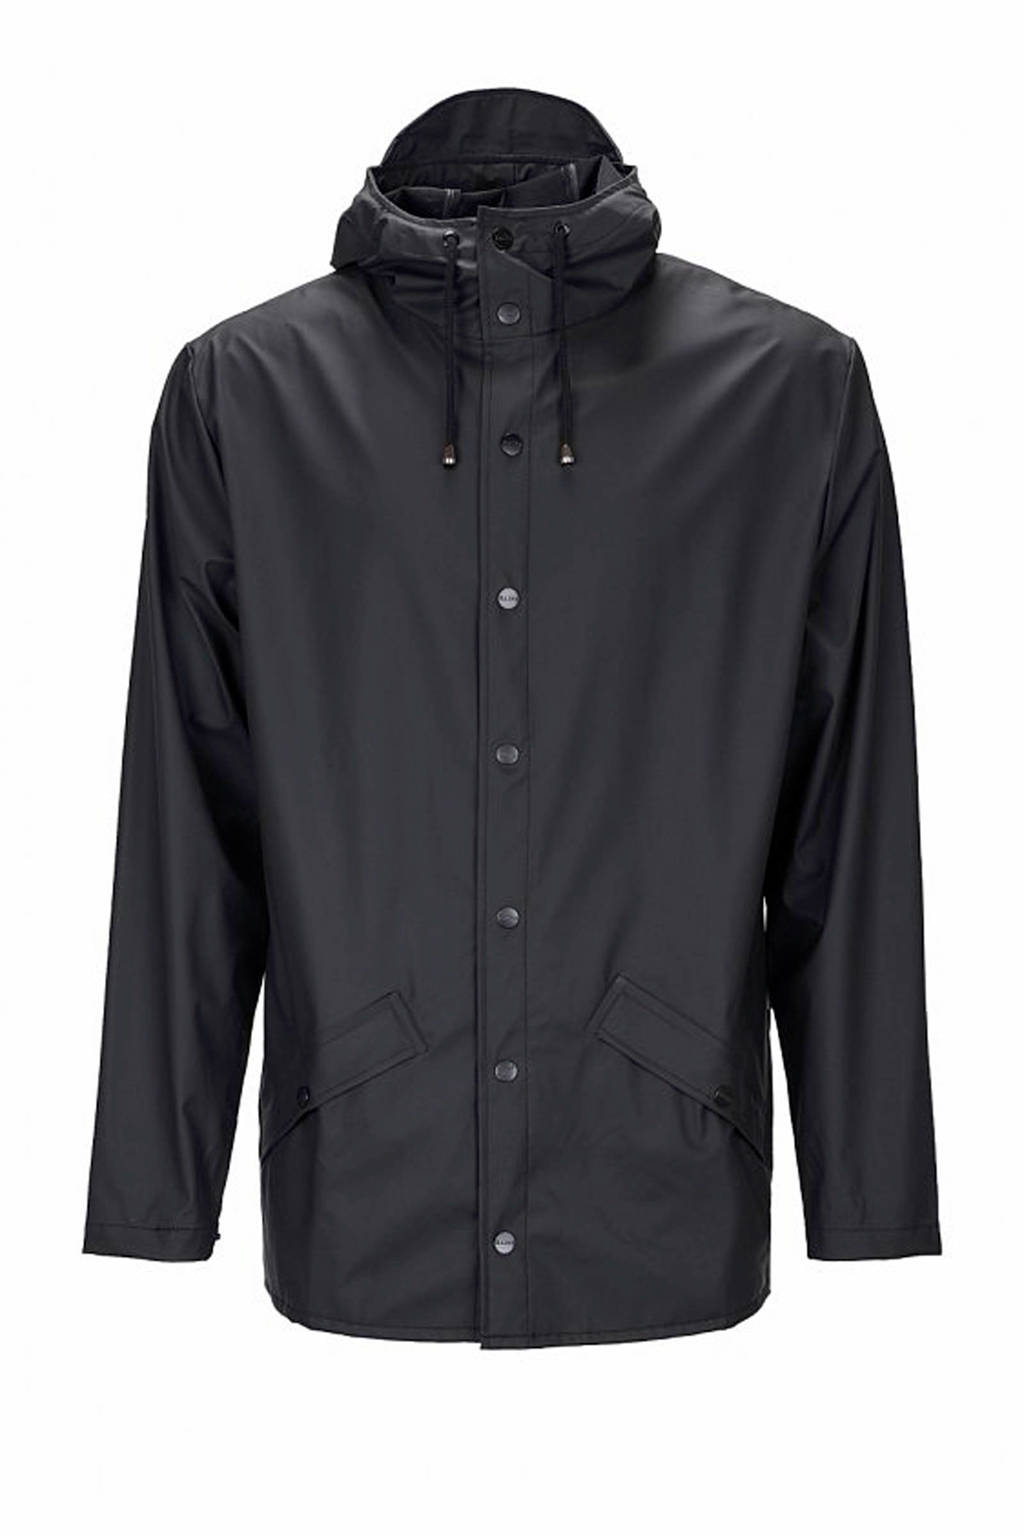 Rains 1201 Jacket regenjas zwart, Zwart